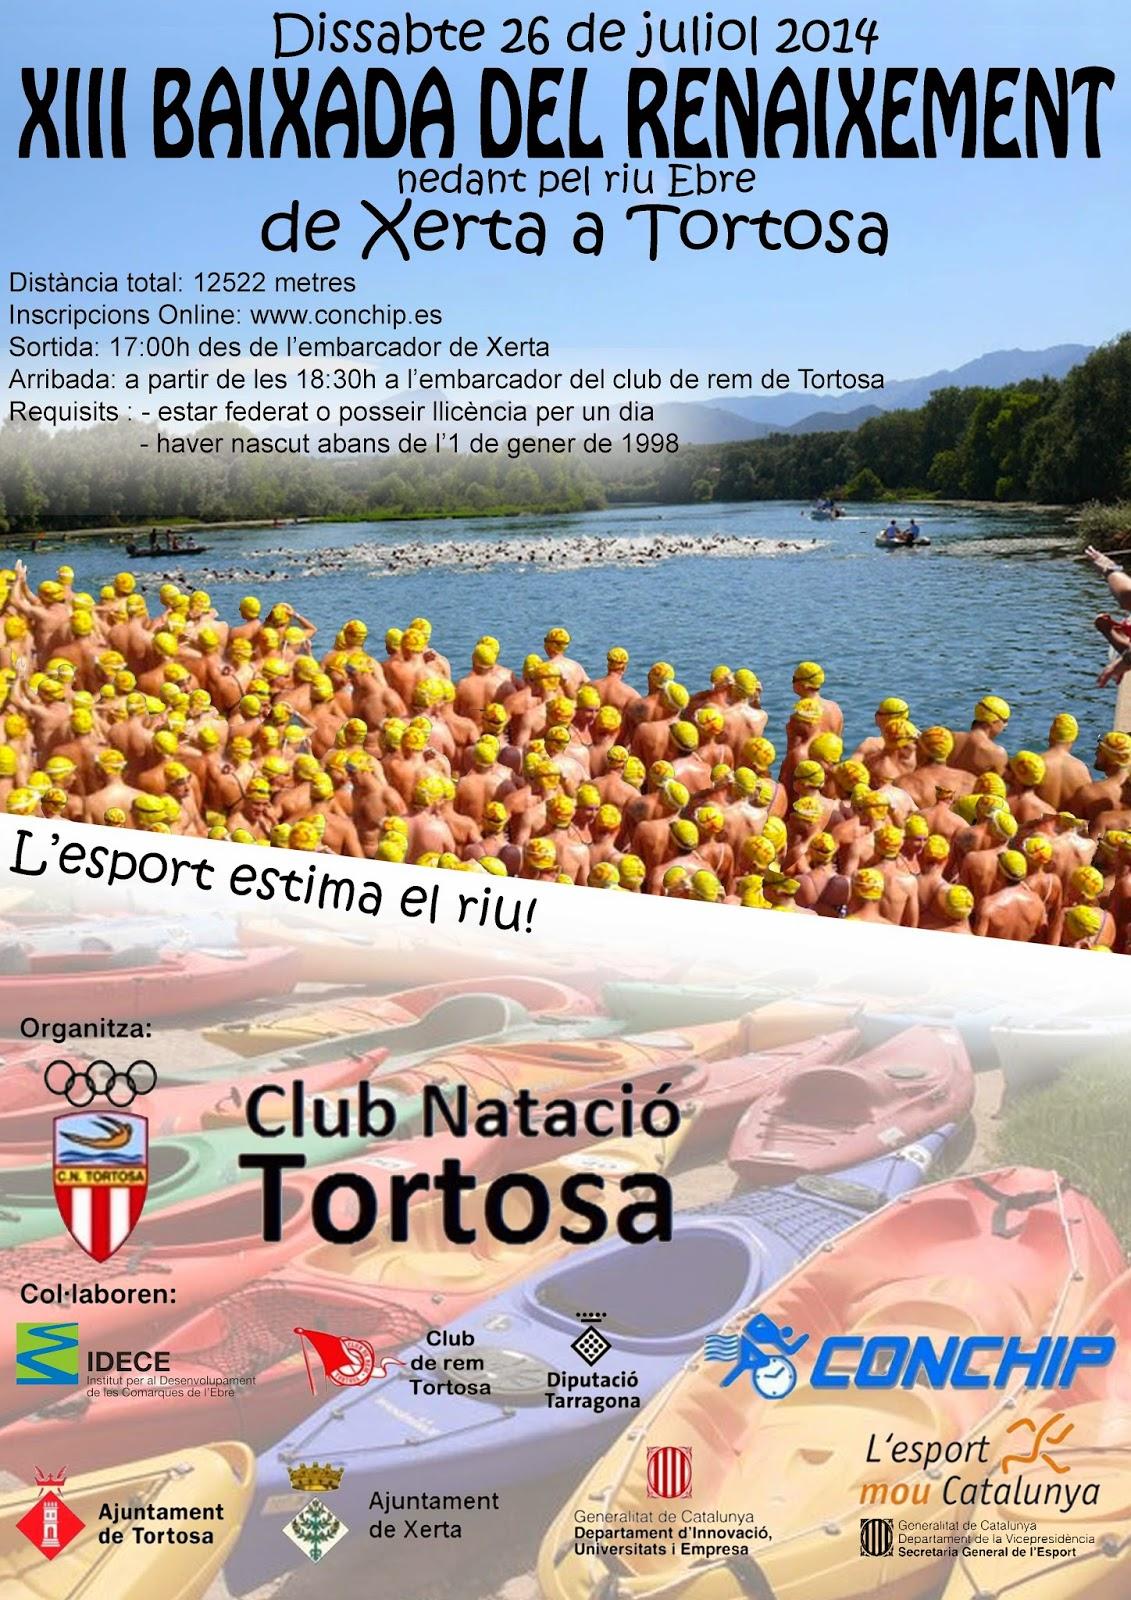 http://www.clubnataciotortosa.com/baixada.php?opm=a&sesio_id=0